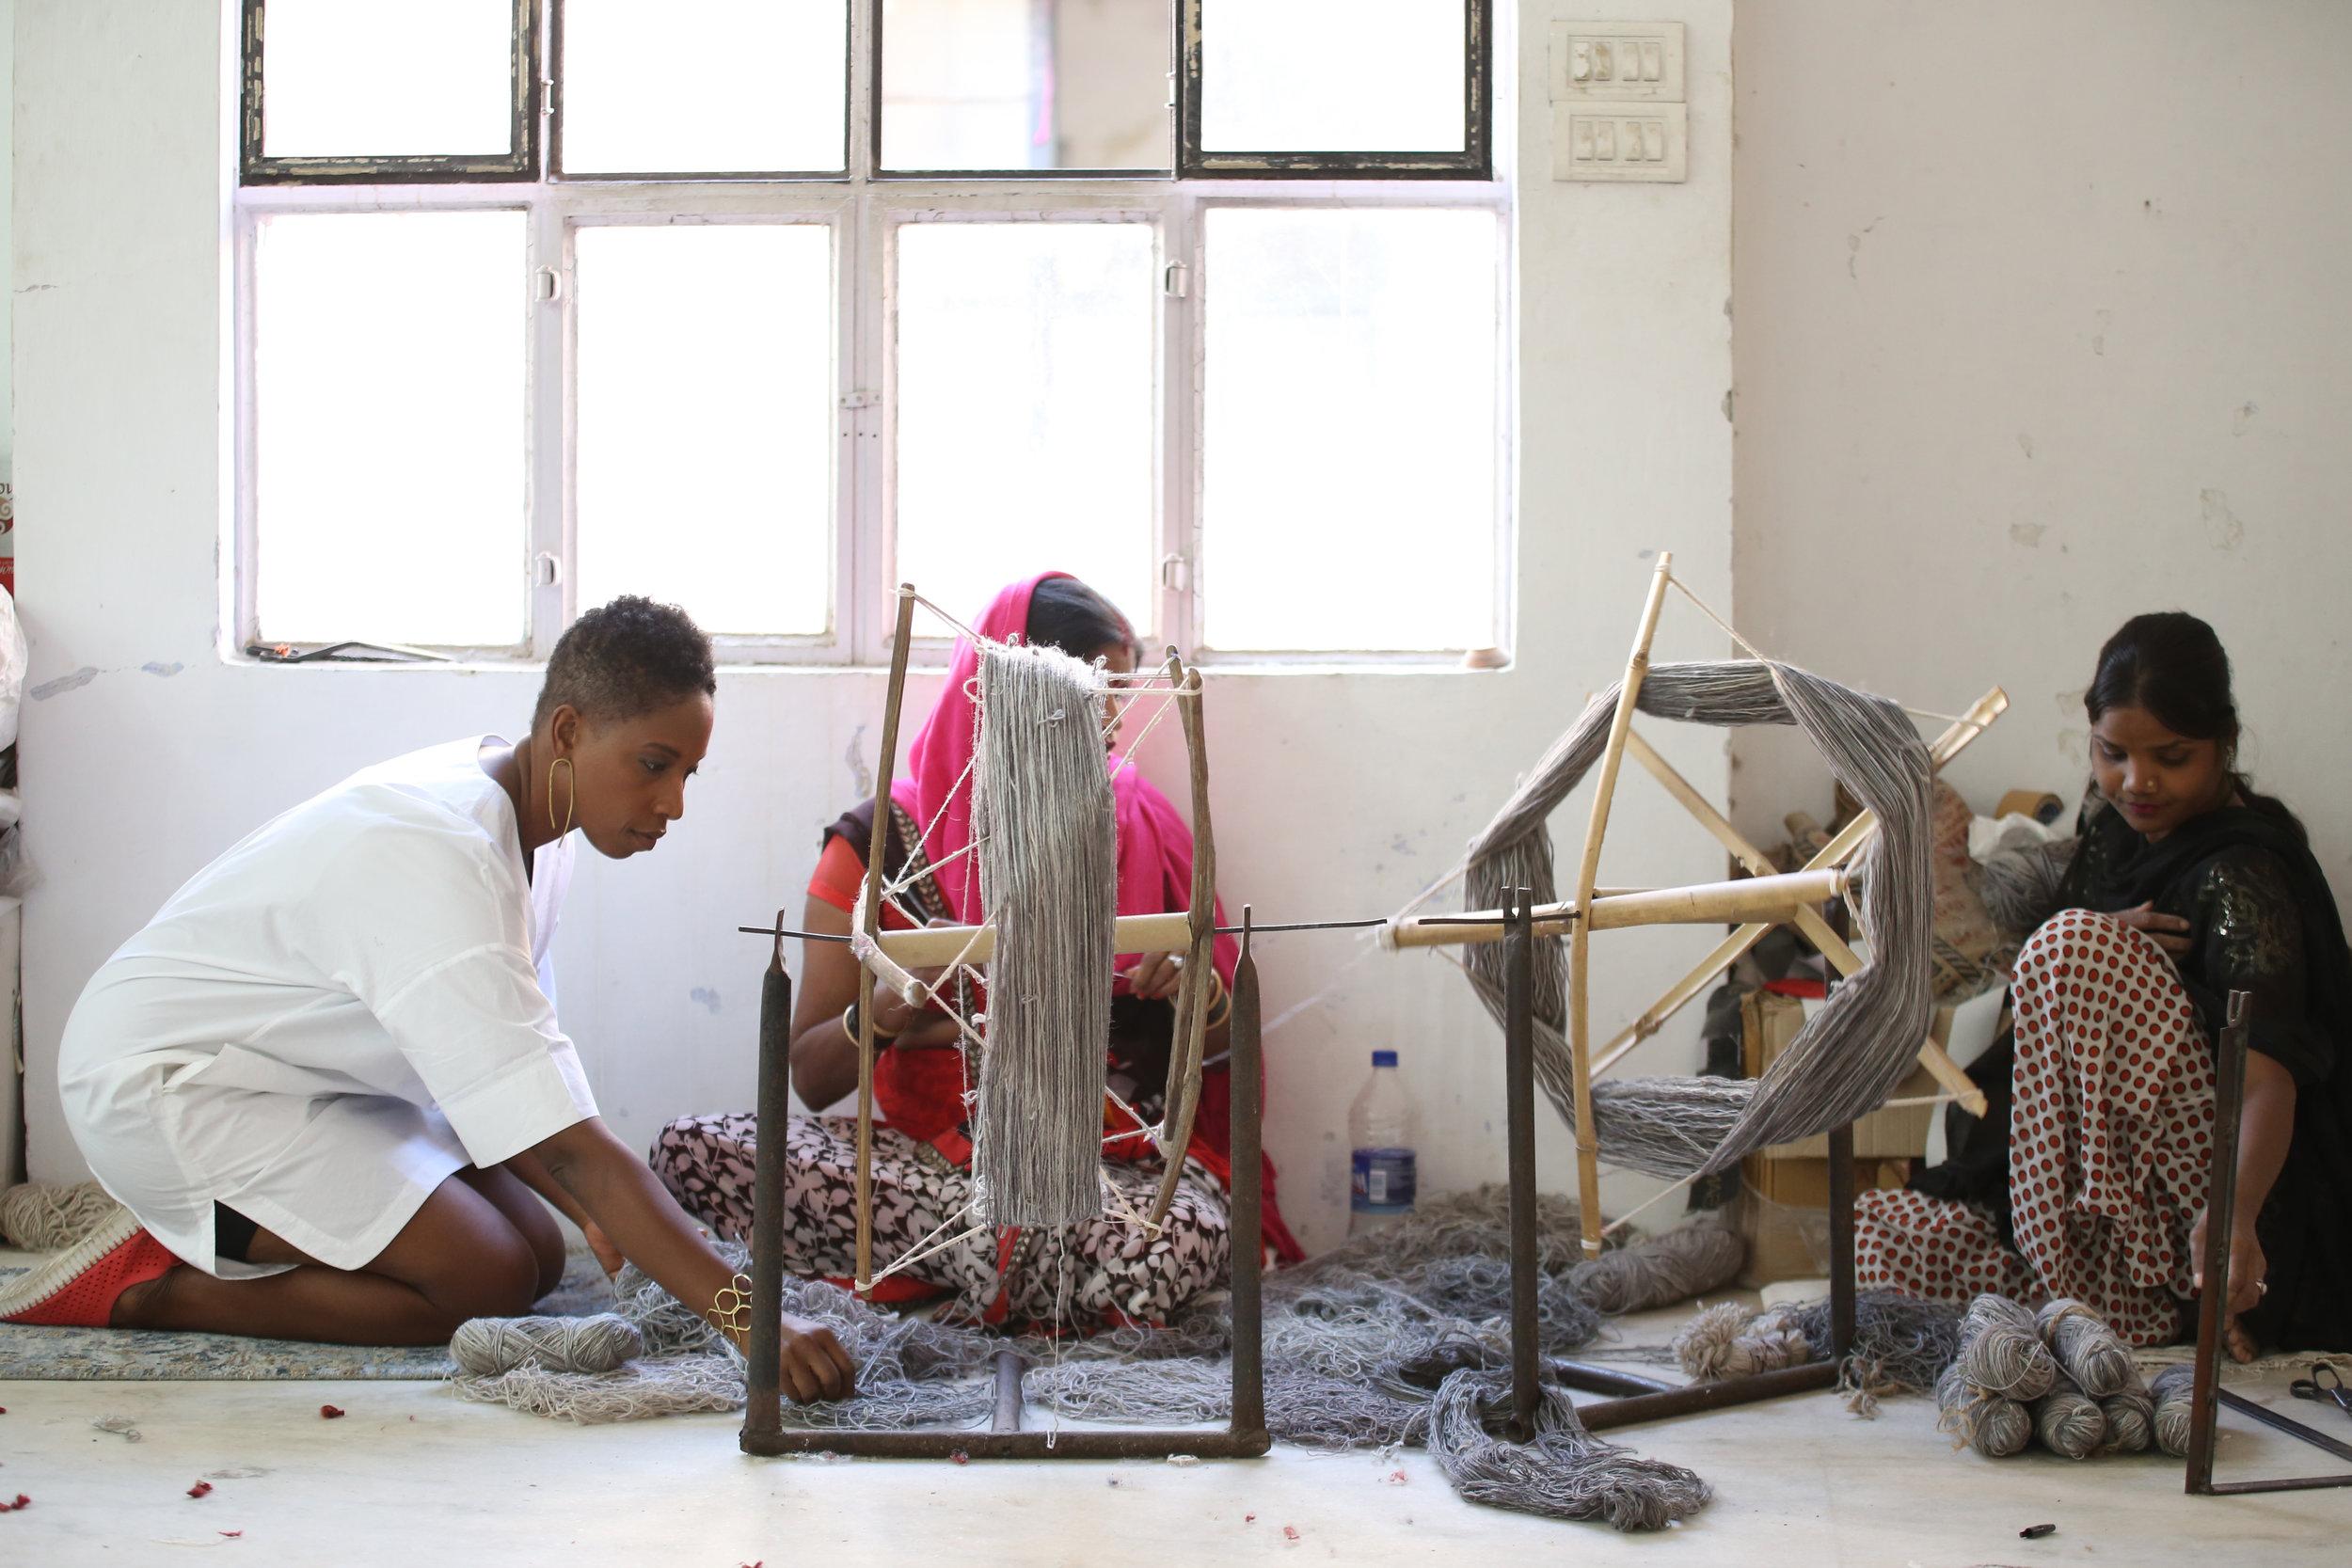 each yarn is hand spun in bundles